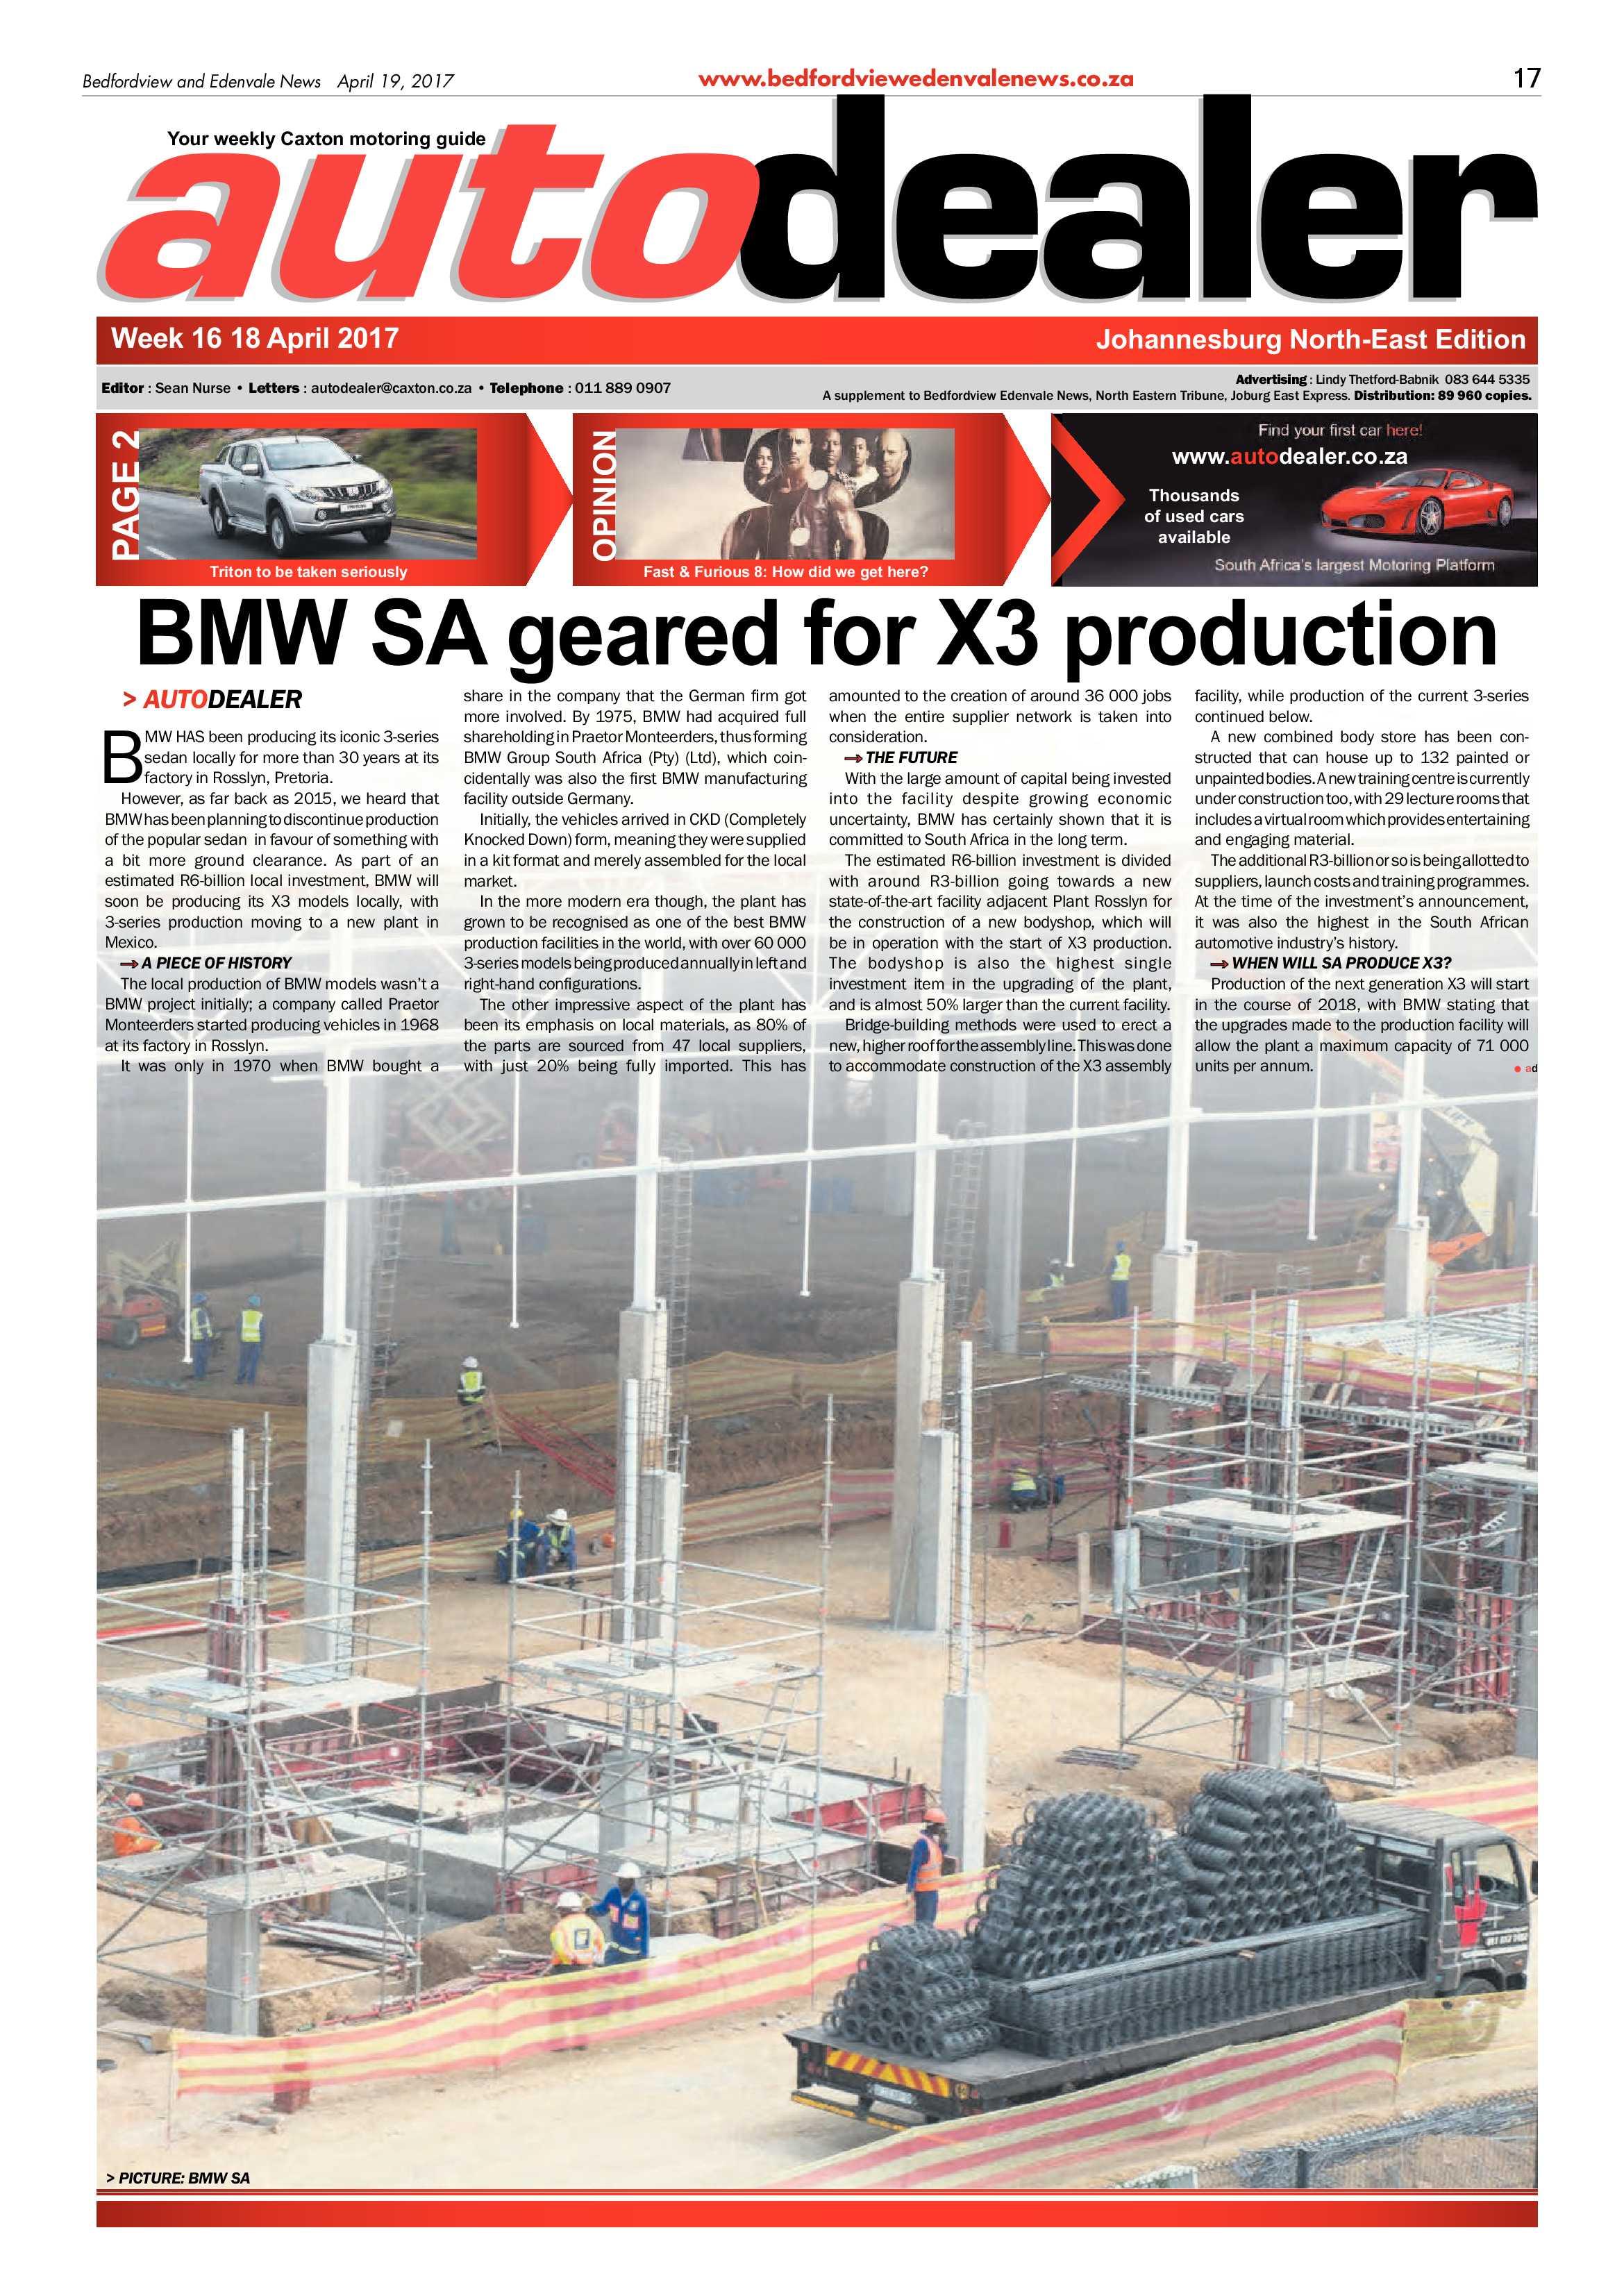 bedfordview-edenvale-news-19-april-2017-epapers-page-17